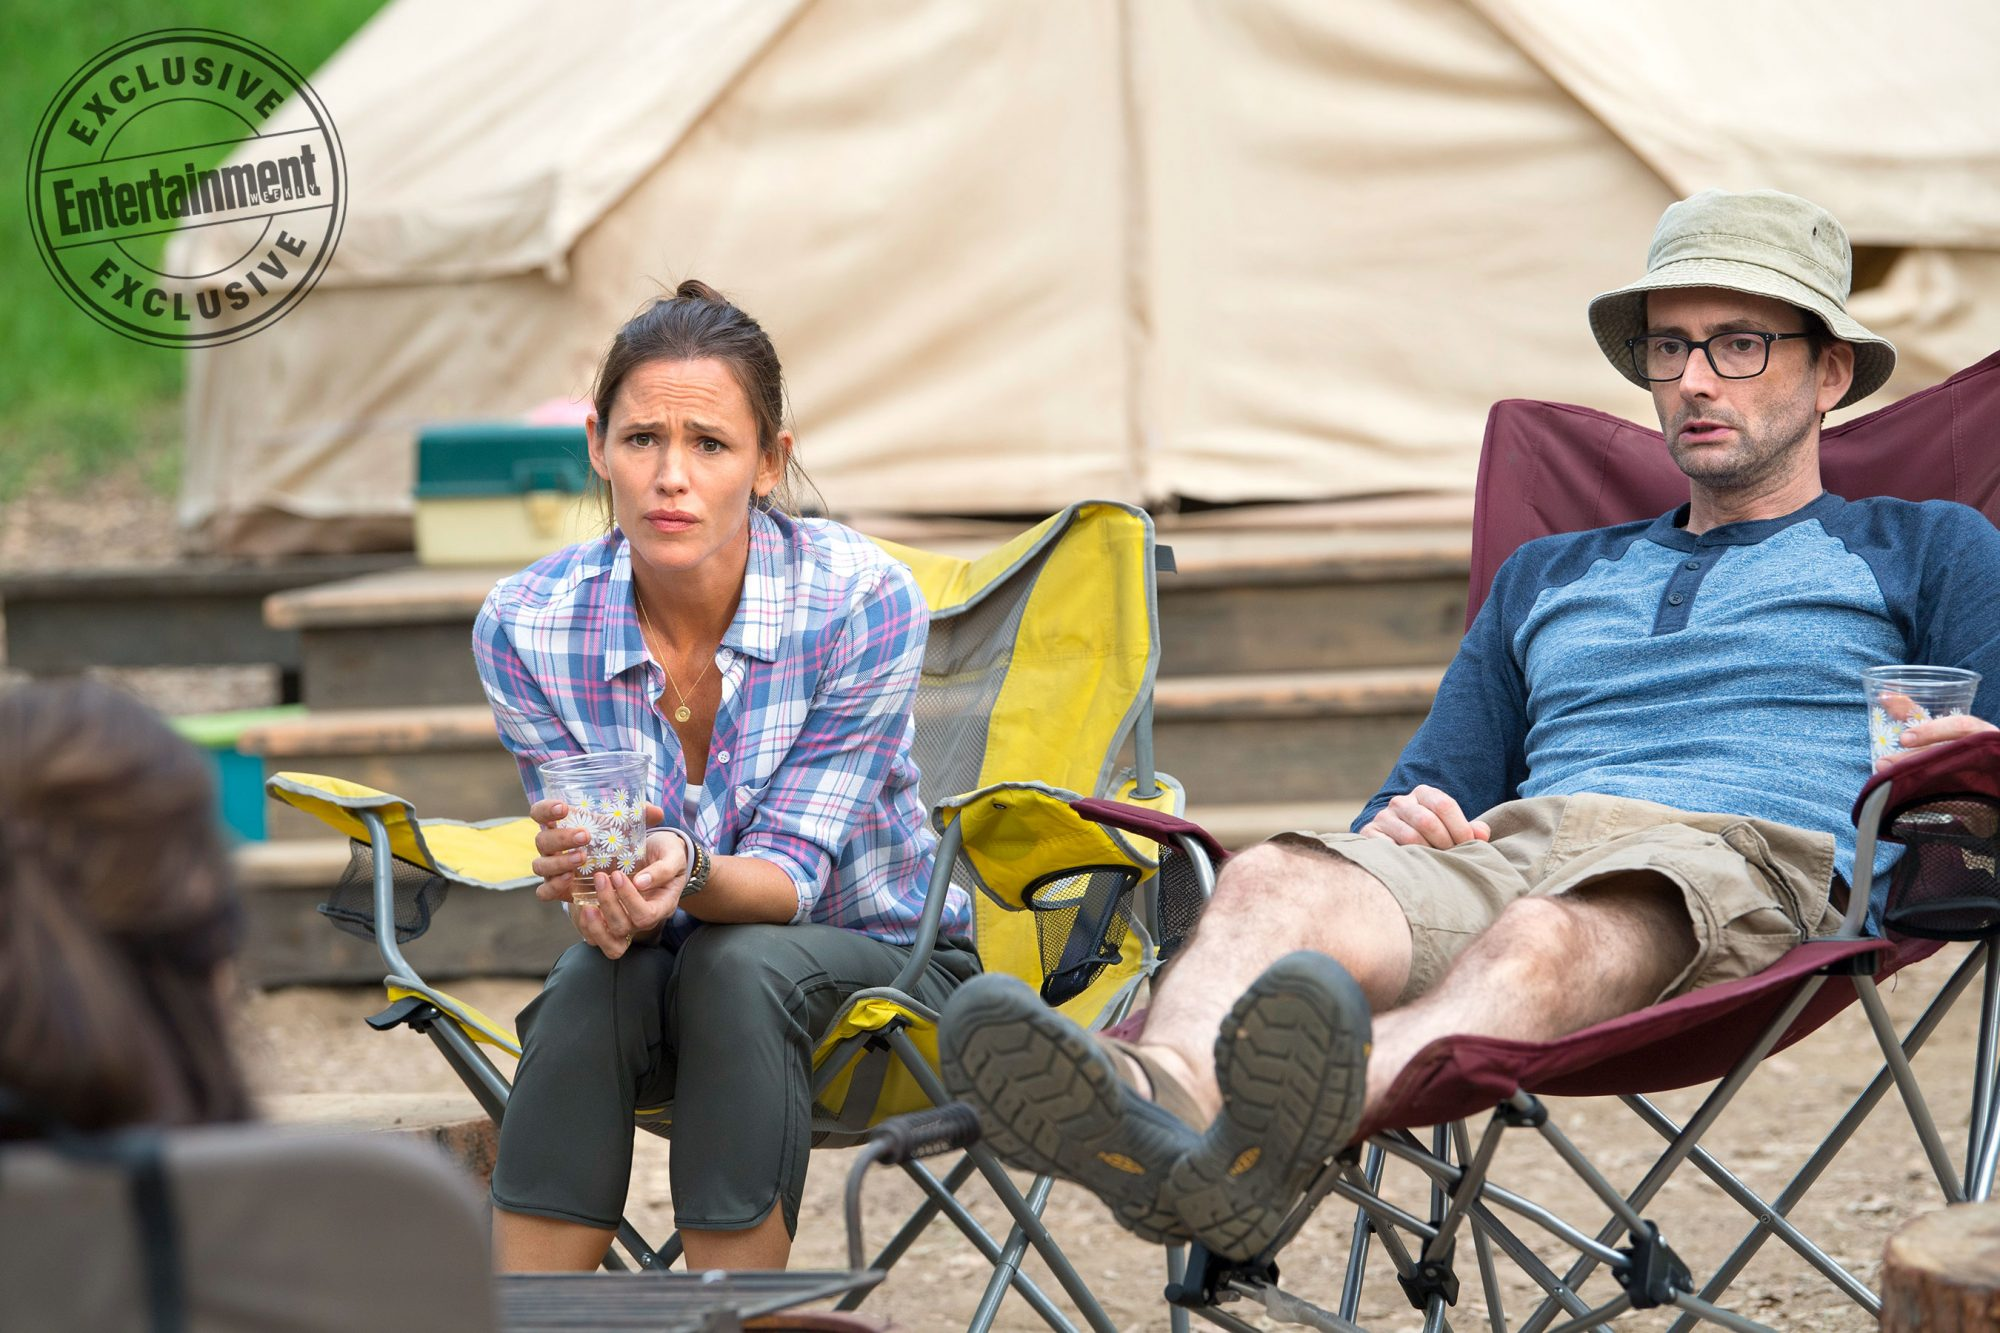 CampingEpsiode: PilotPictured: Jennifer Garner and David Tennant